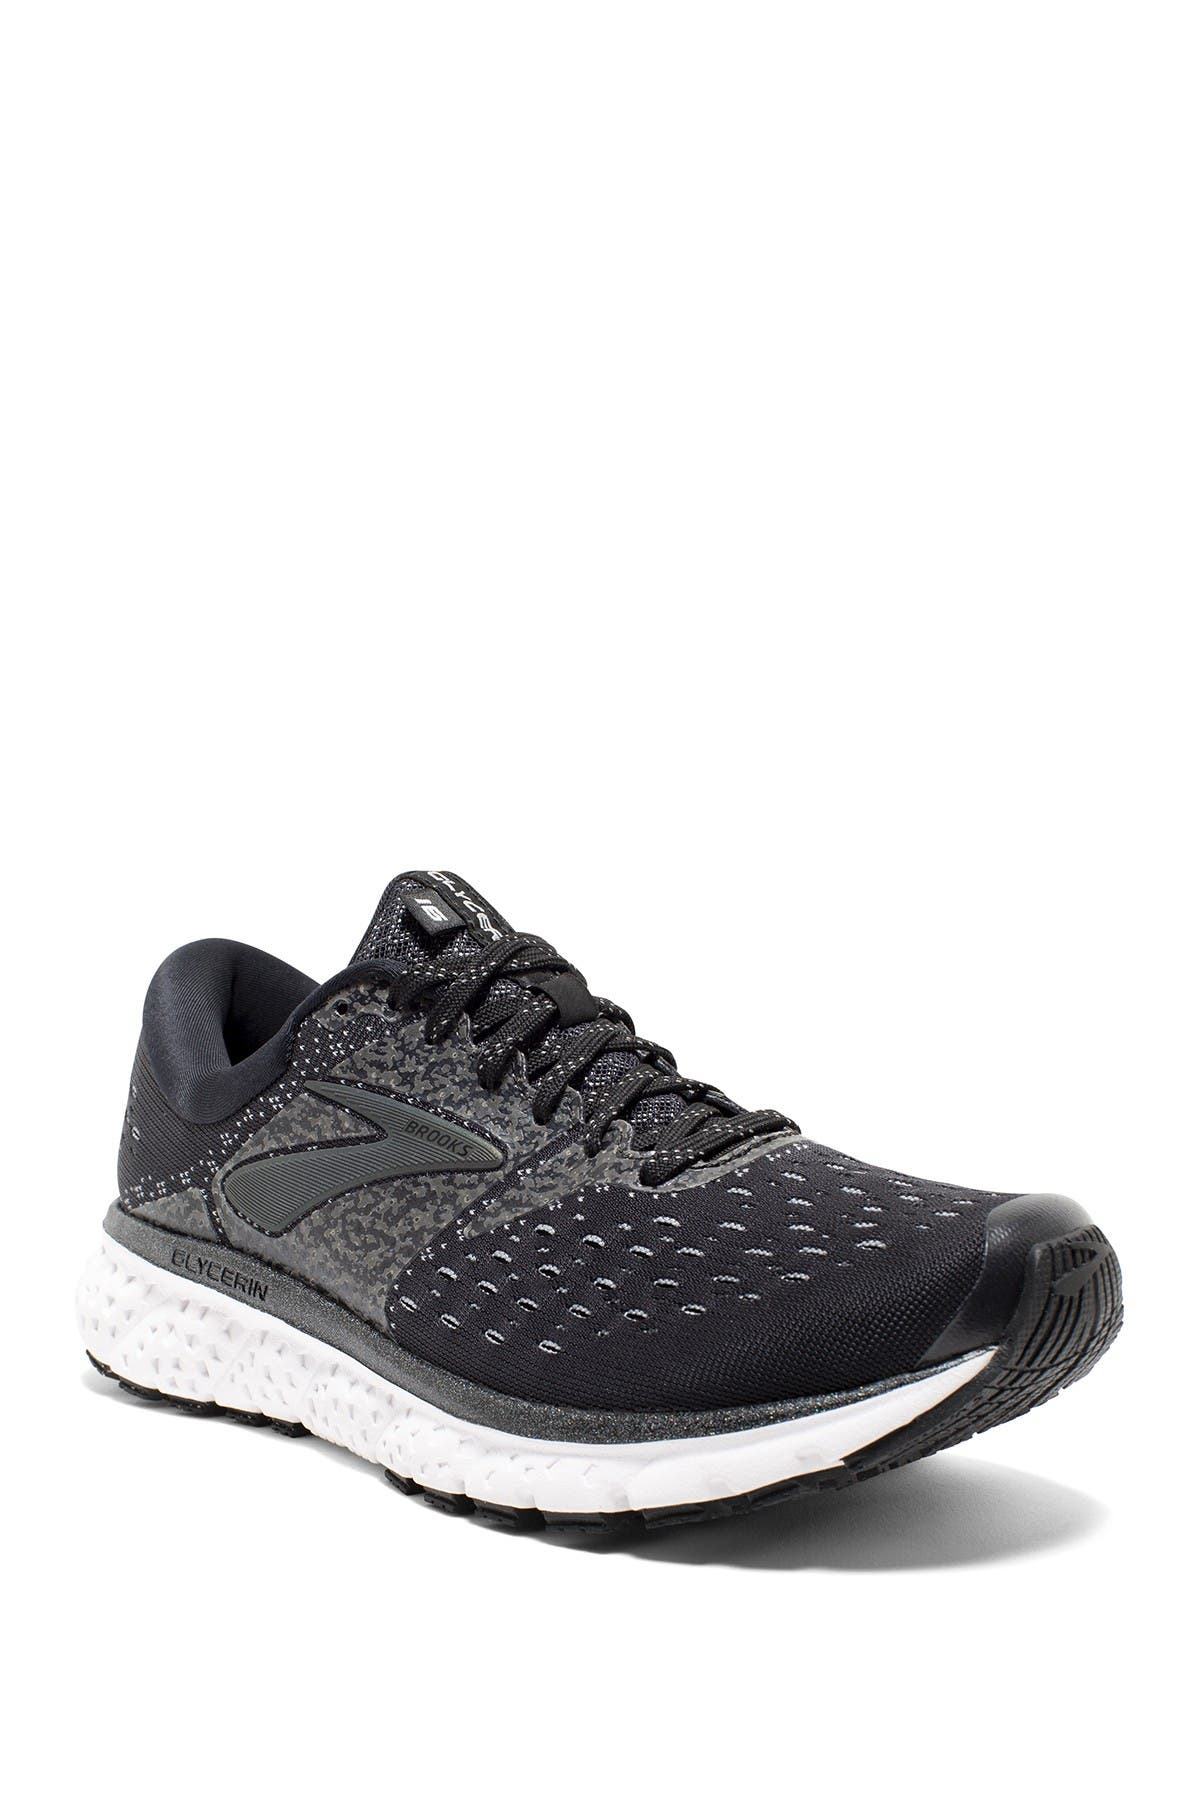 Brooks | Glycerin 16 Running Shoe